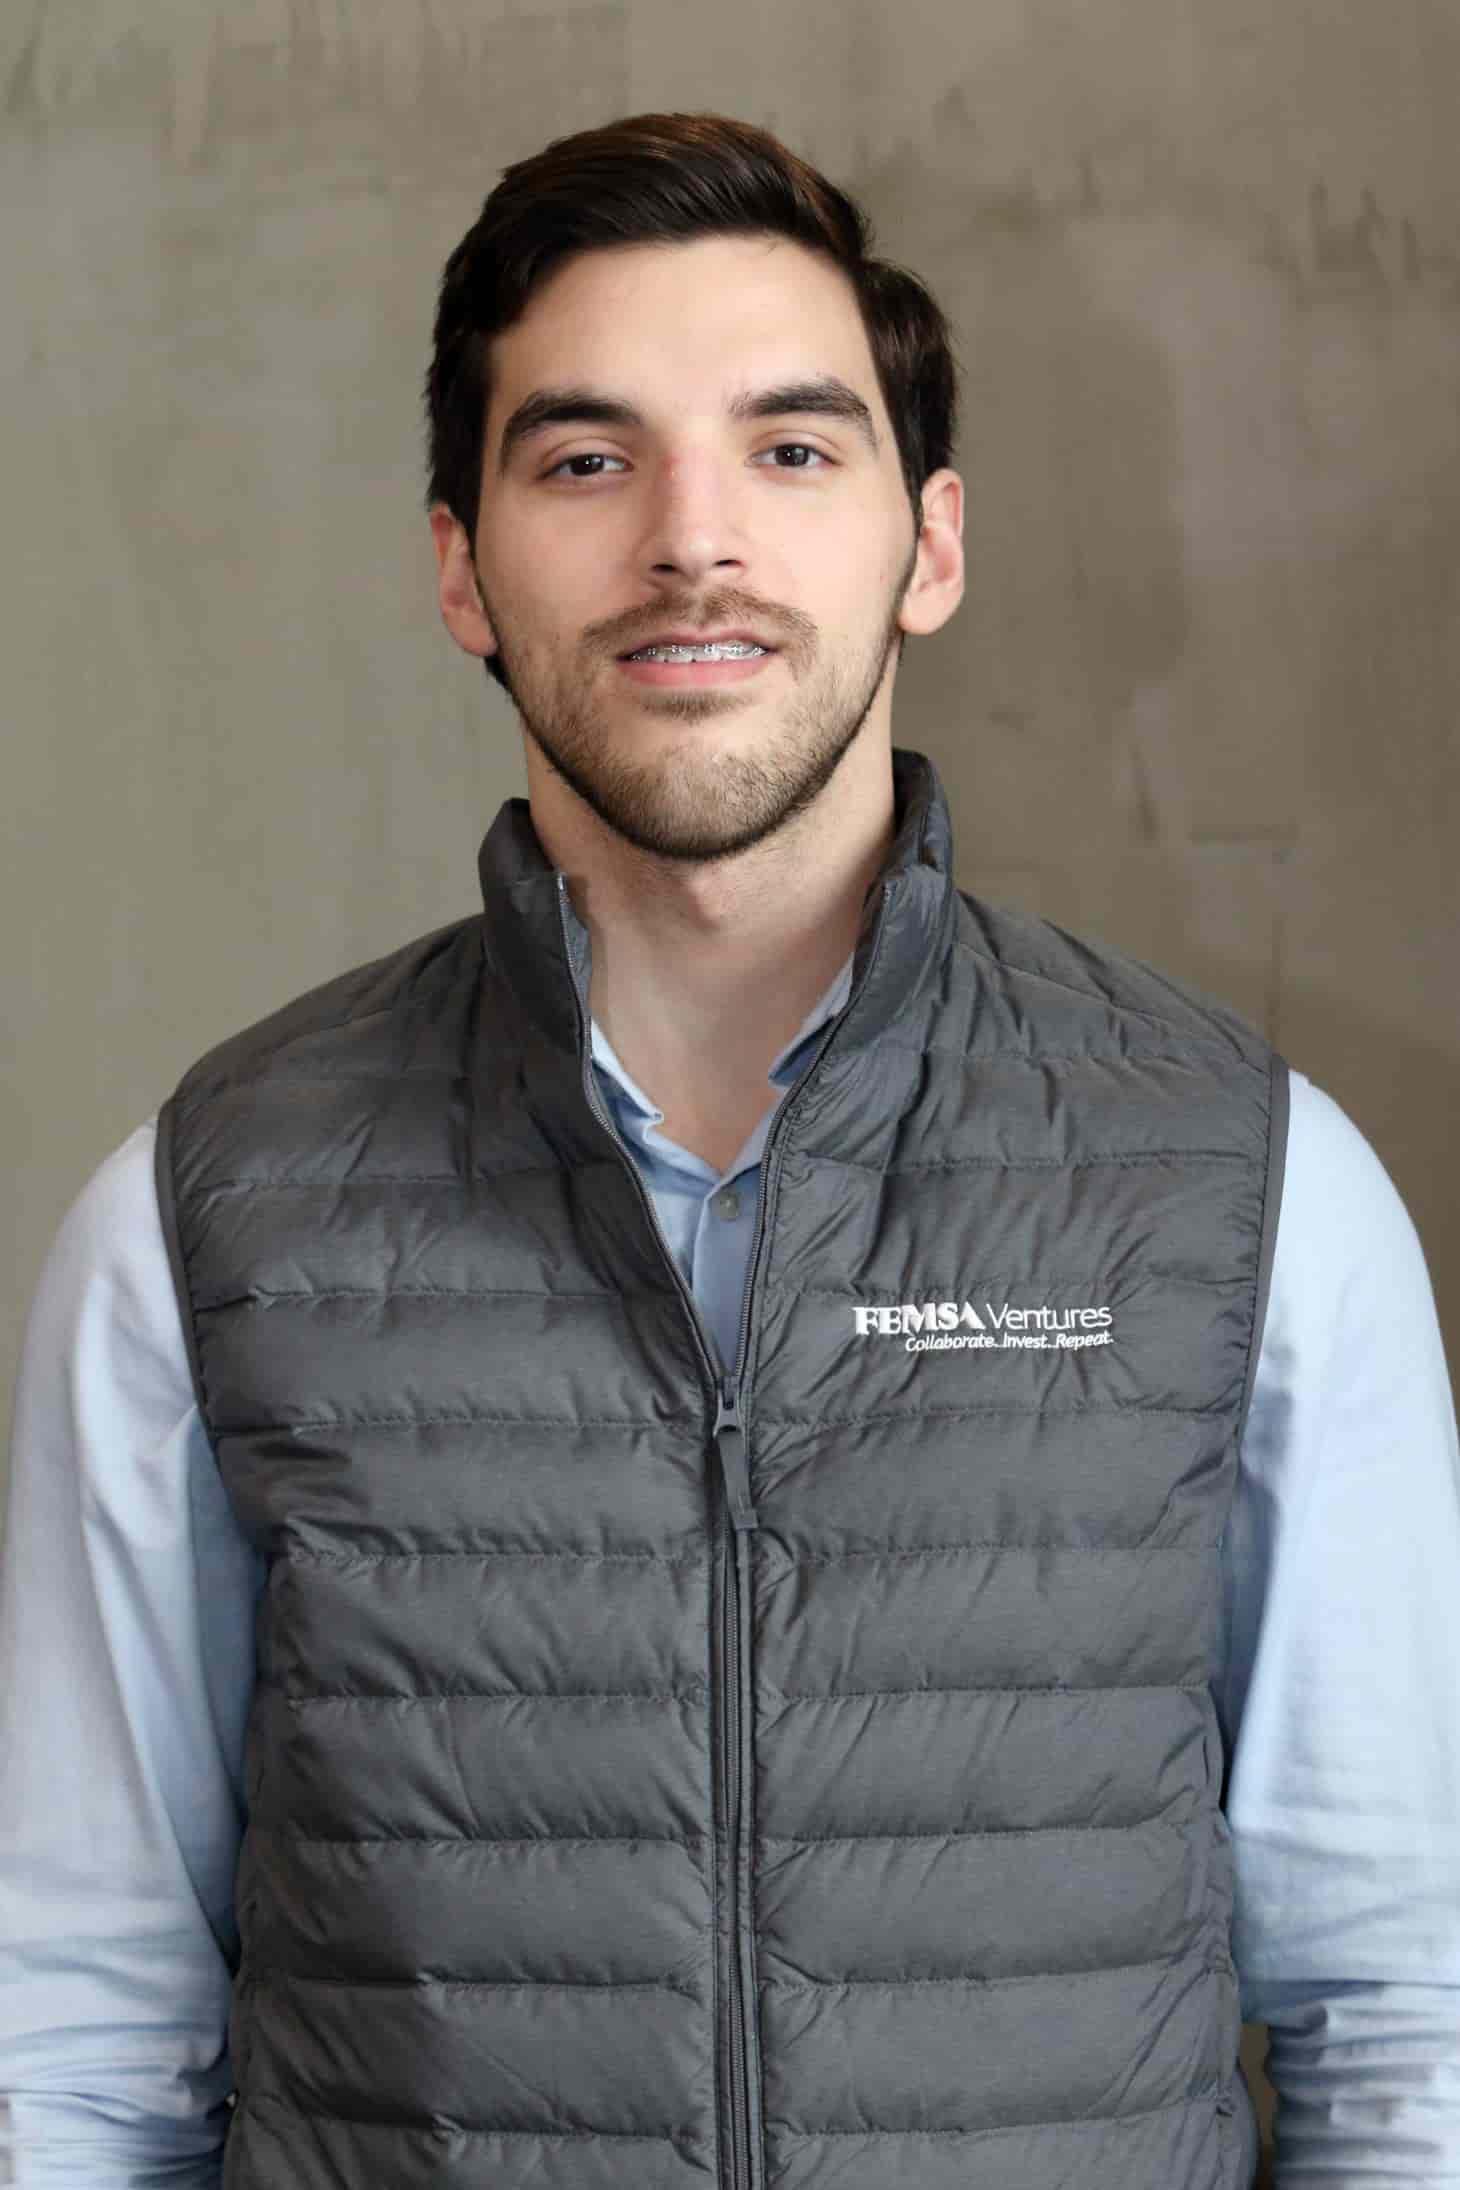 Ian Medford-Gonzalez